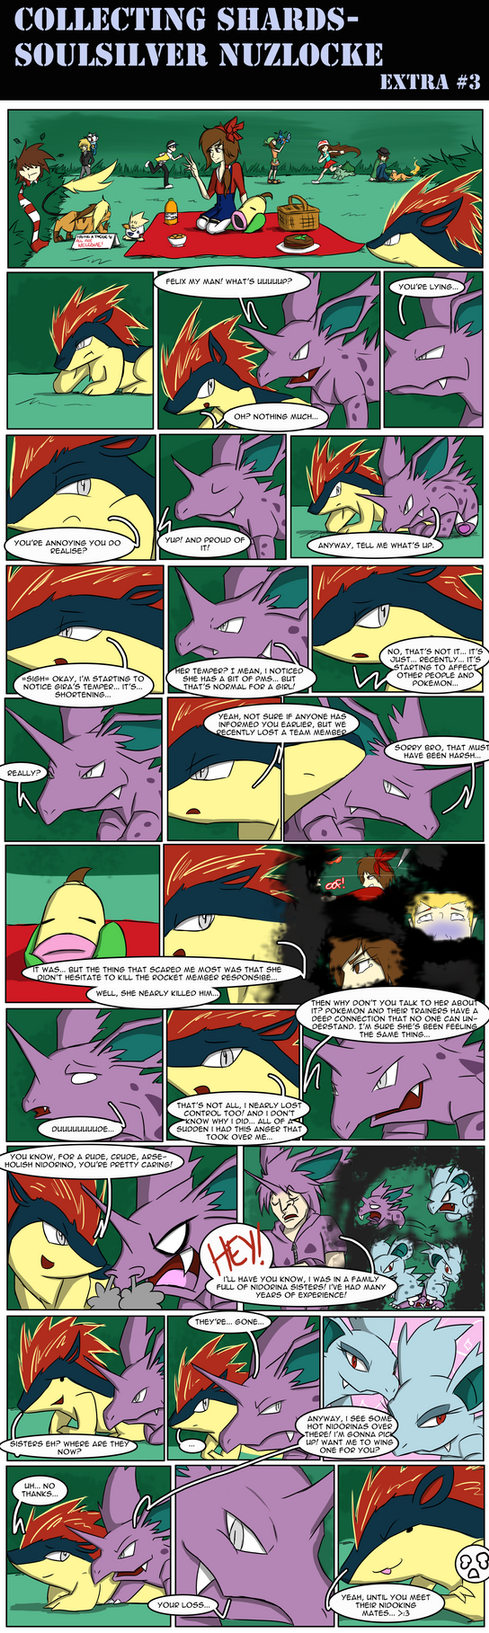 Soul Silver Nuzlocke EXTRA#4 by LittleScarecrow